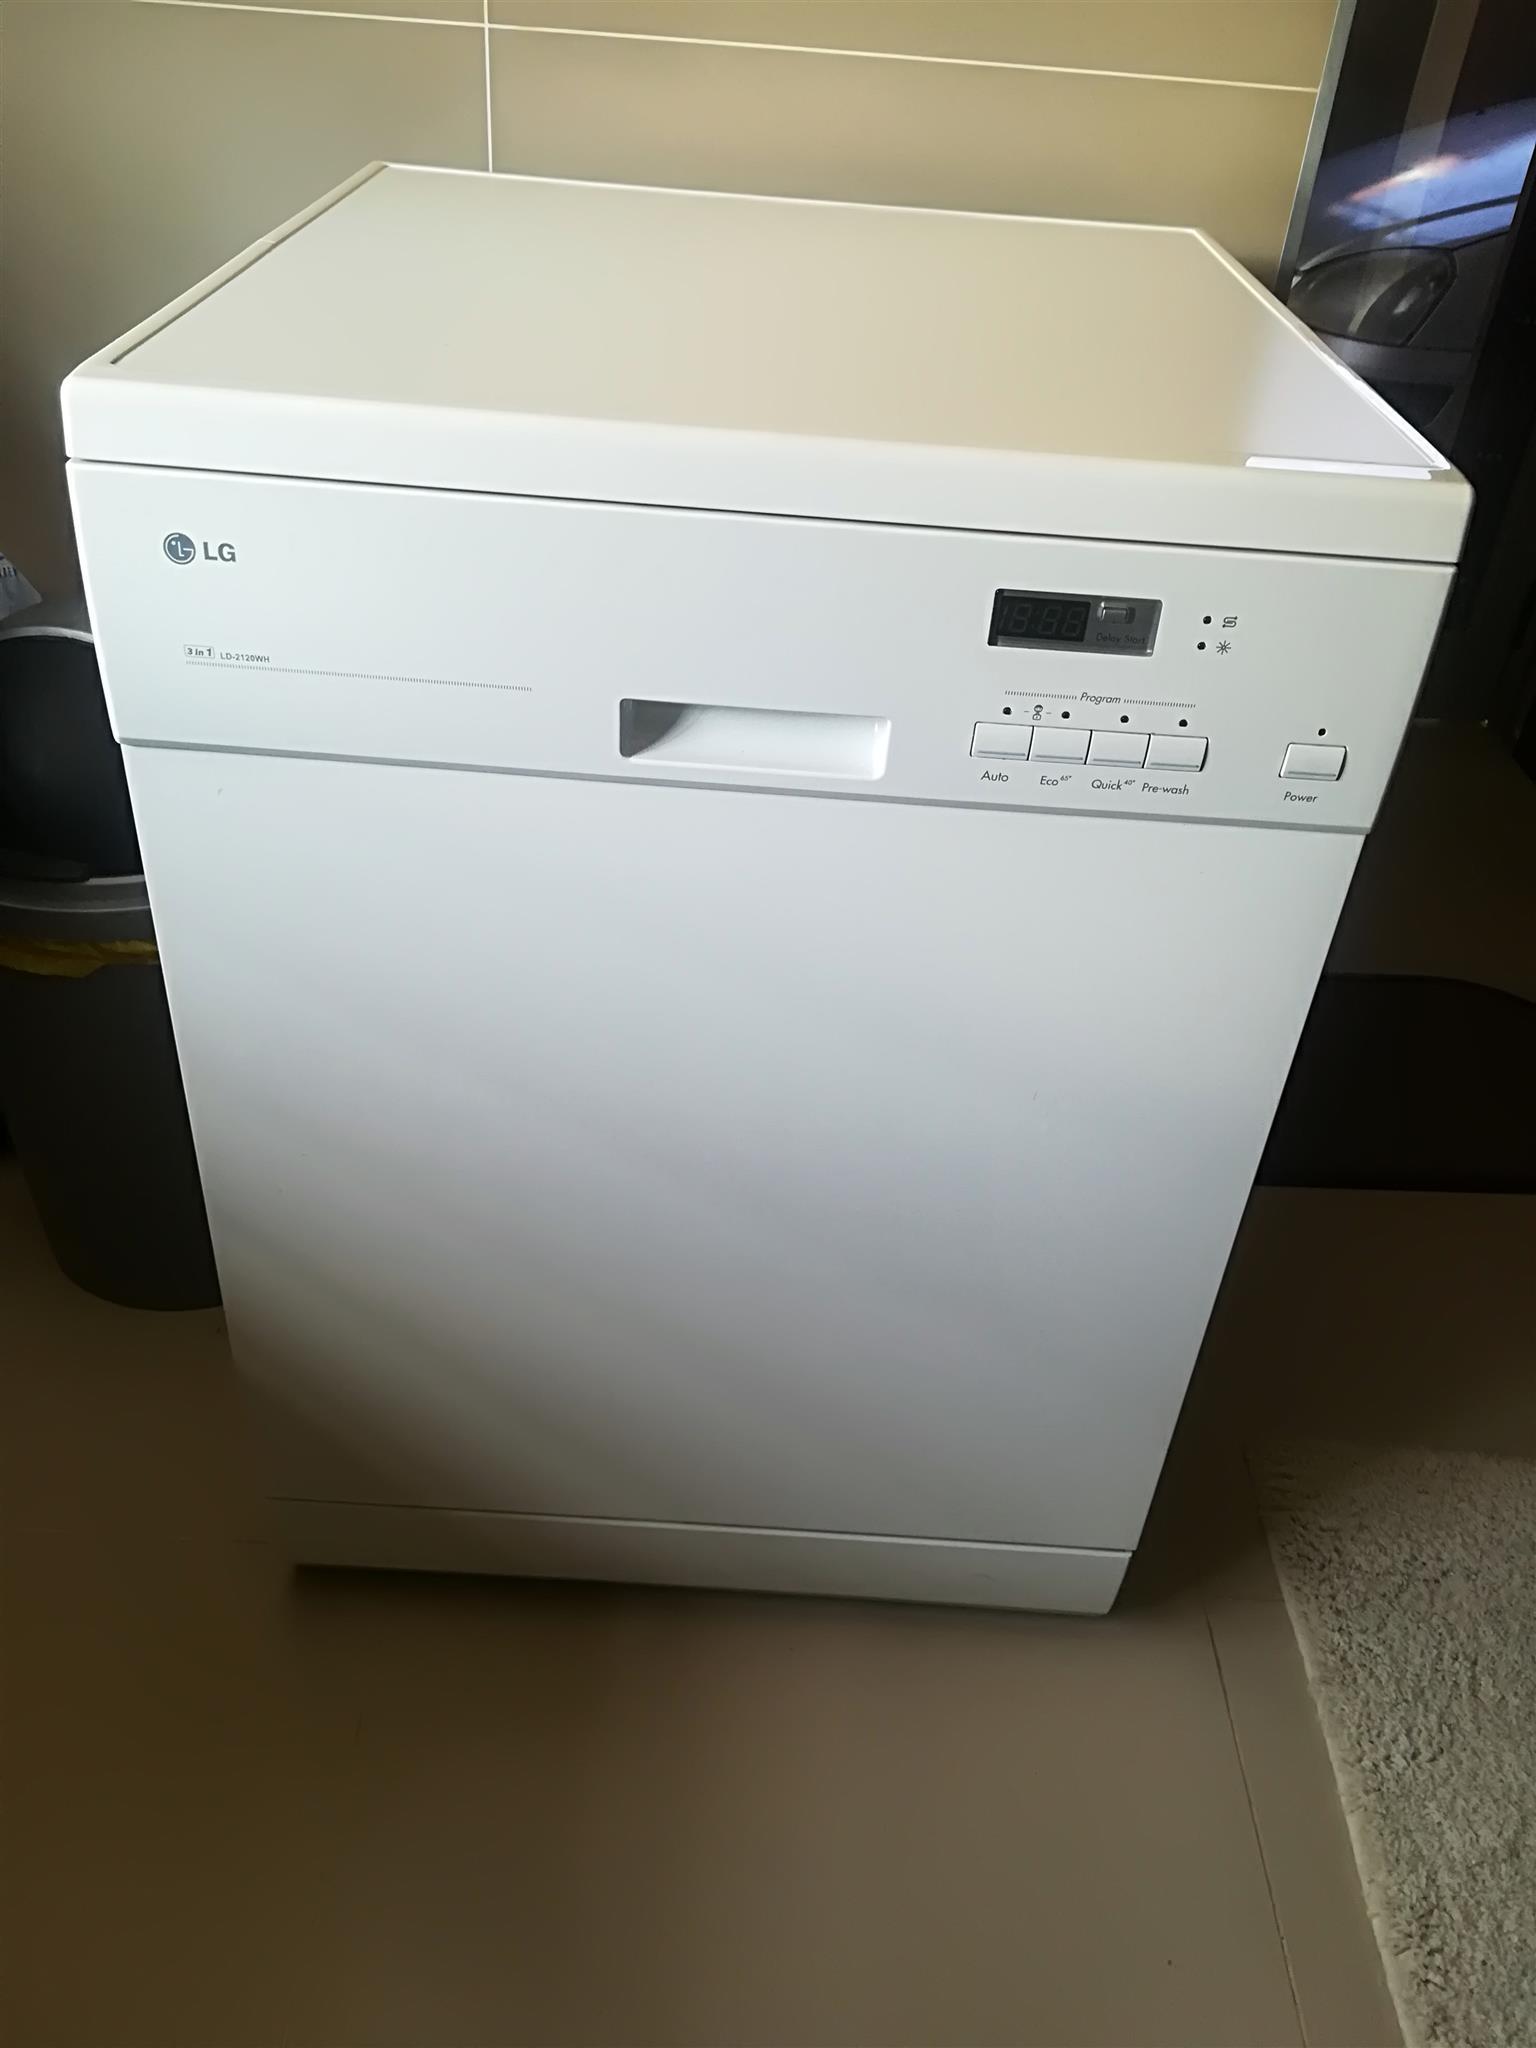 Brand new LG 3in1 Watersaver Dishwasher